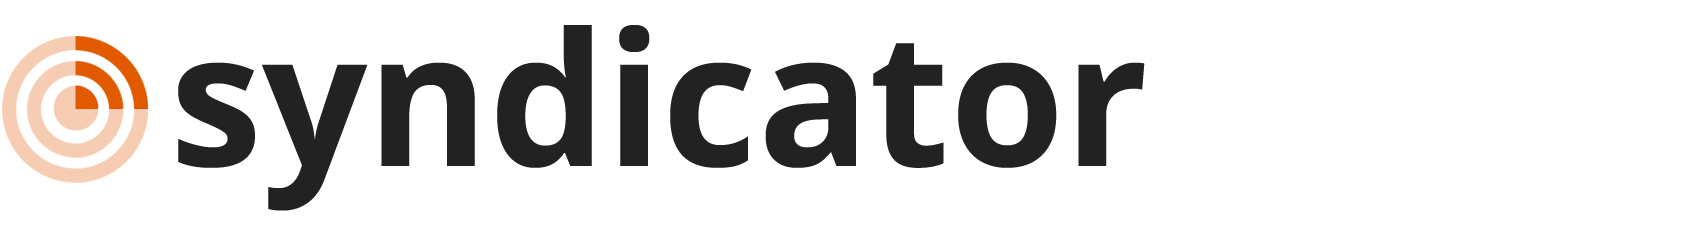 rss_syndicator_logo